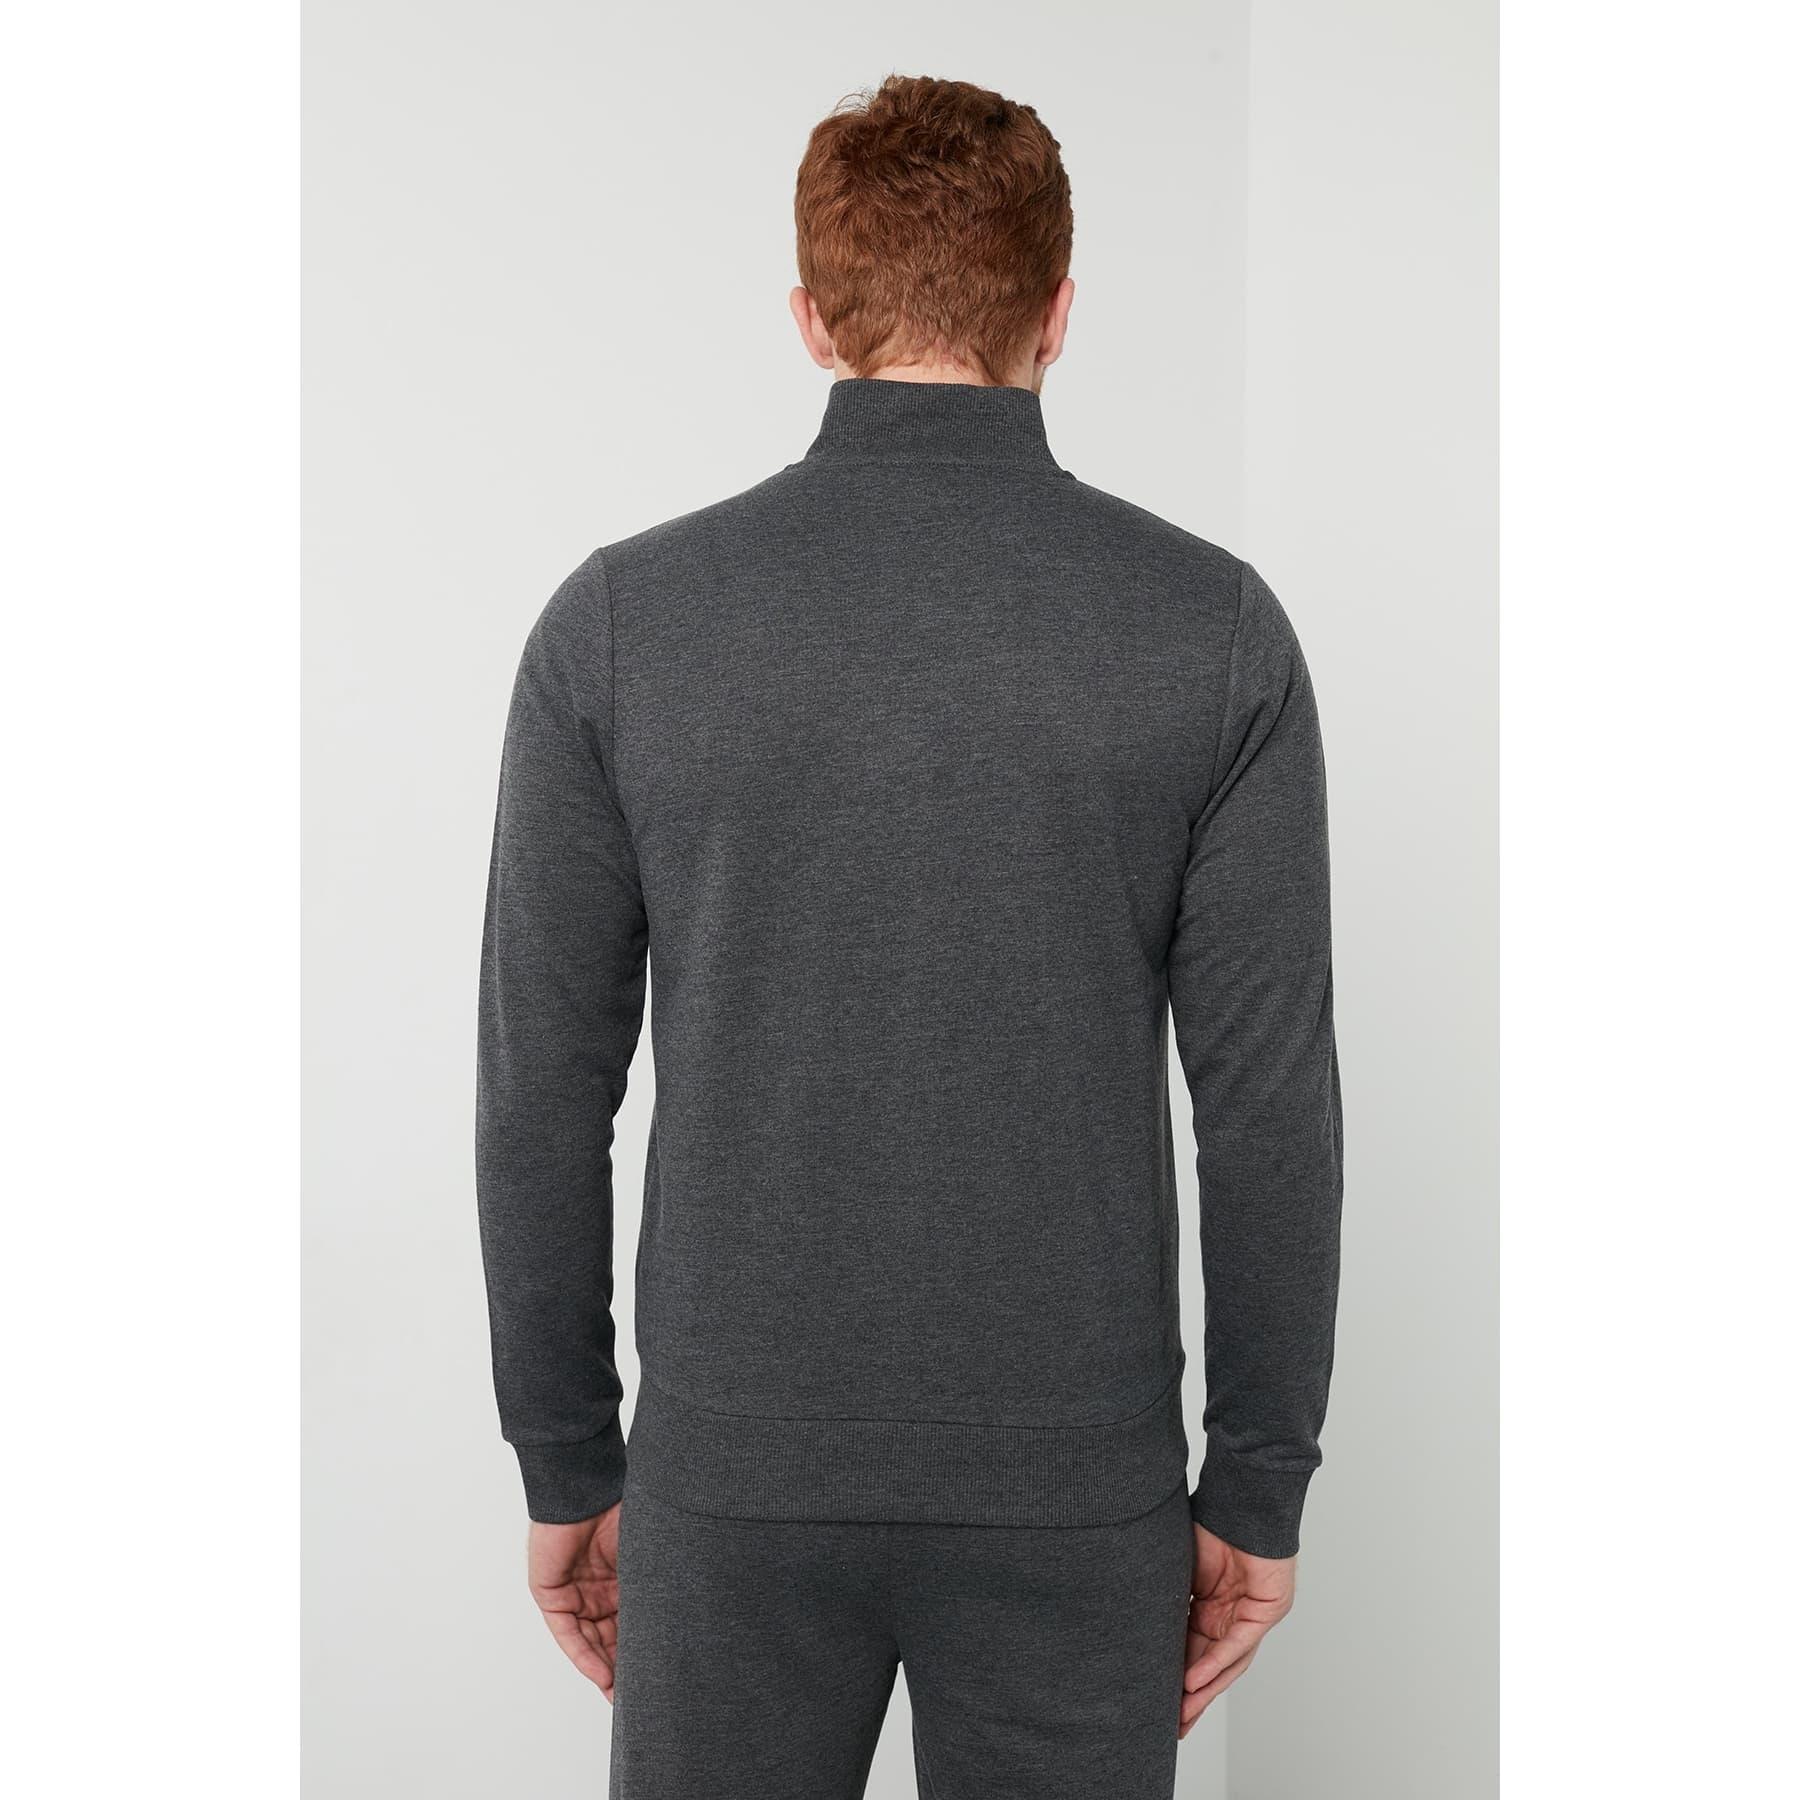 Casal Erkek Siyah Zip Ceket (920000-2001)